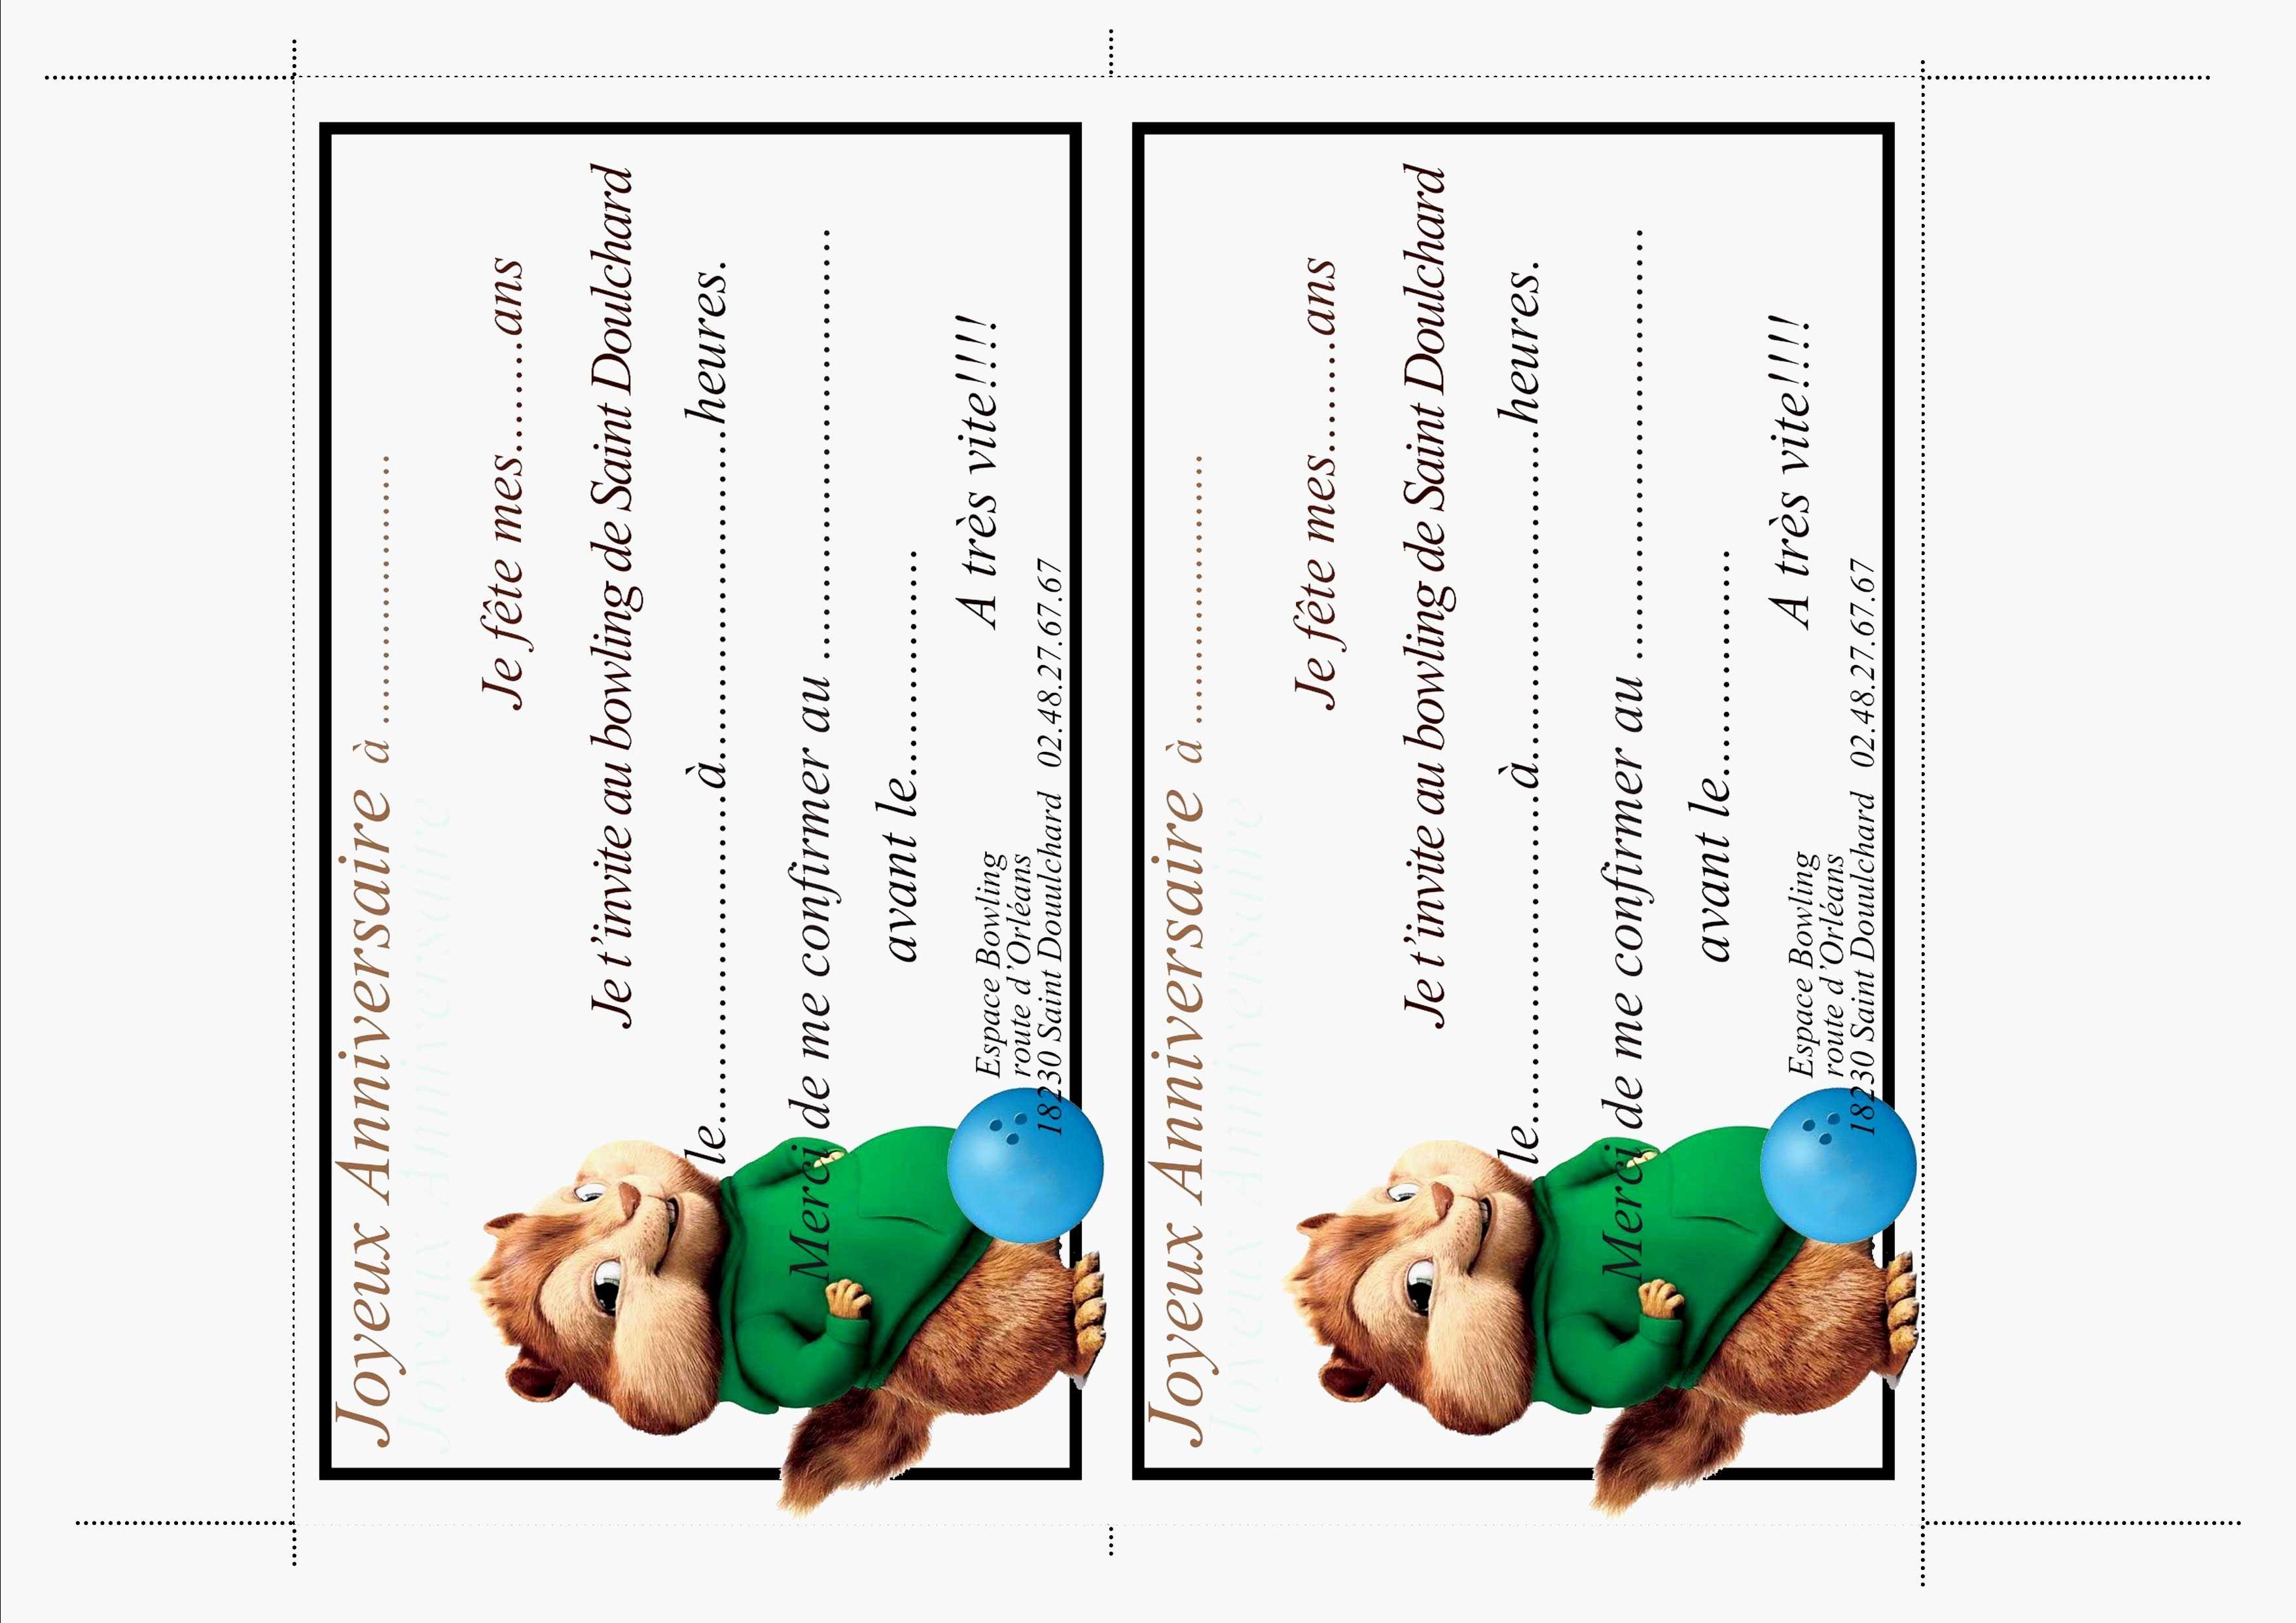 Ii Carte Damp039anniversaire Pat Patrouille A Imprimer 650 460 Carte Invitation Anniversaire Carte Remerciement Anniversaire Invitation Anniversaire Gratuite